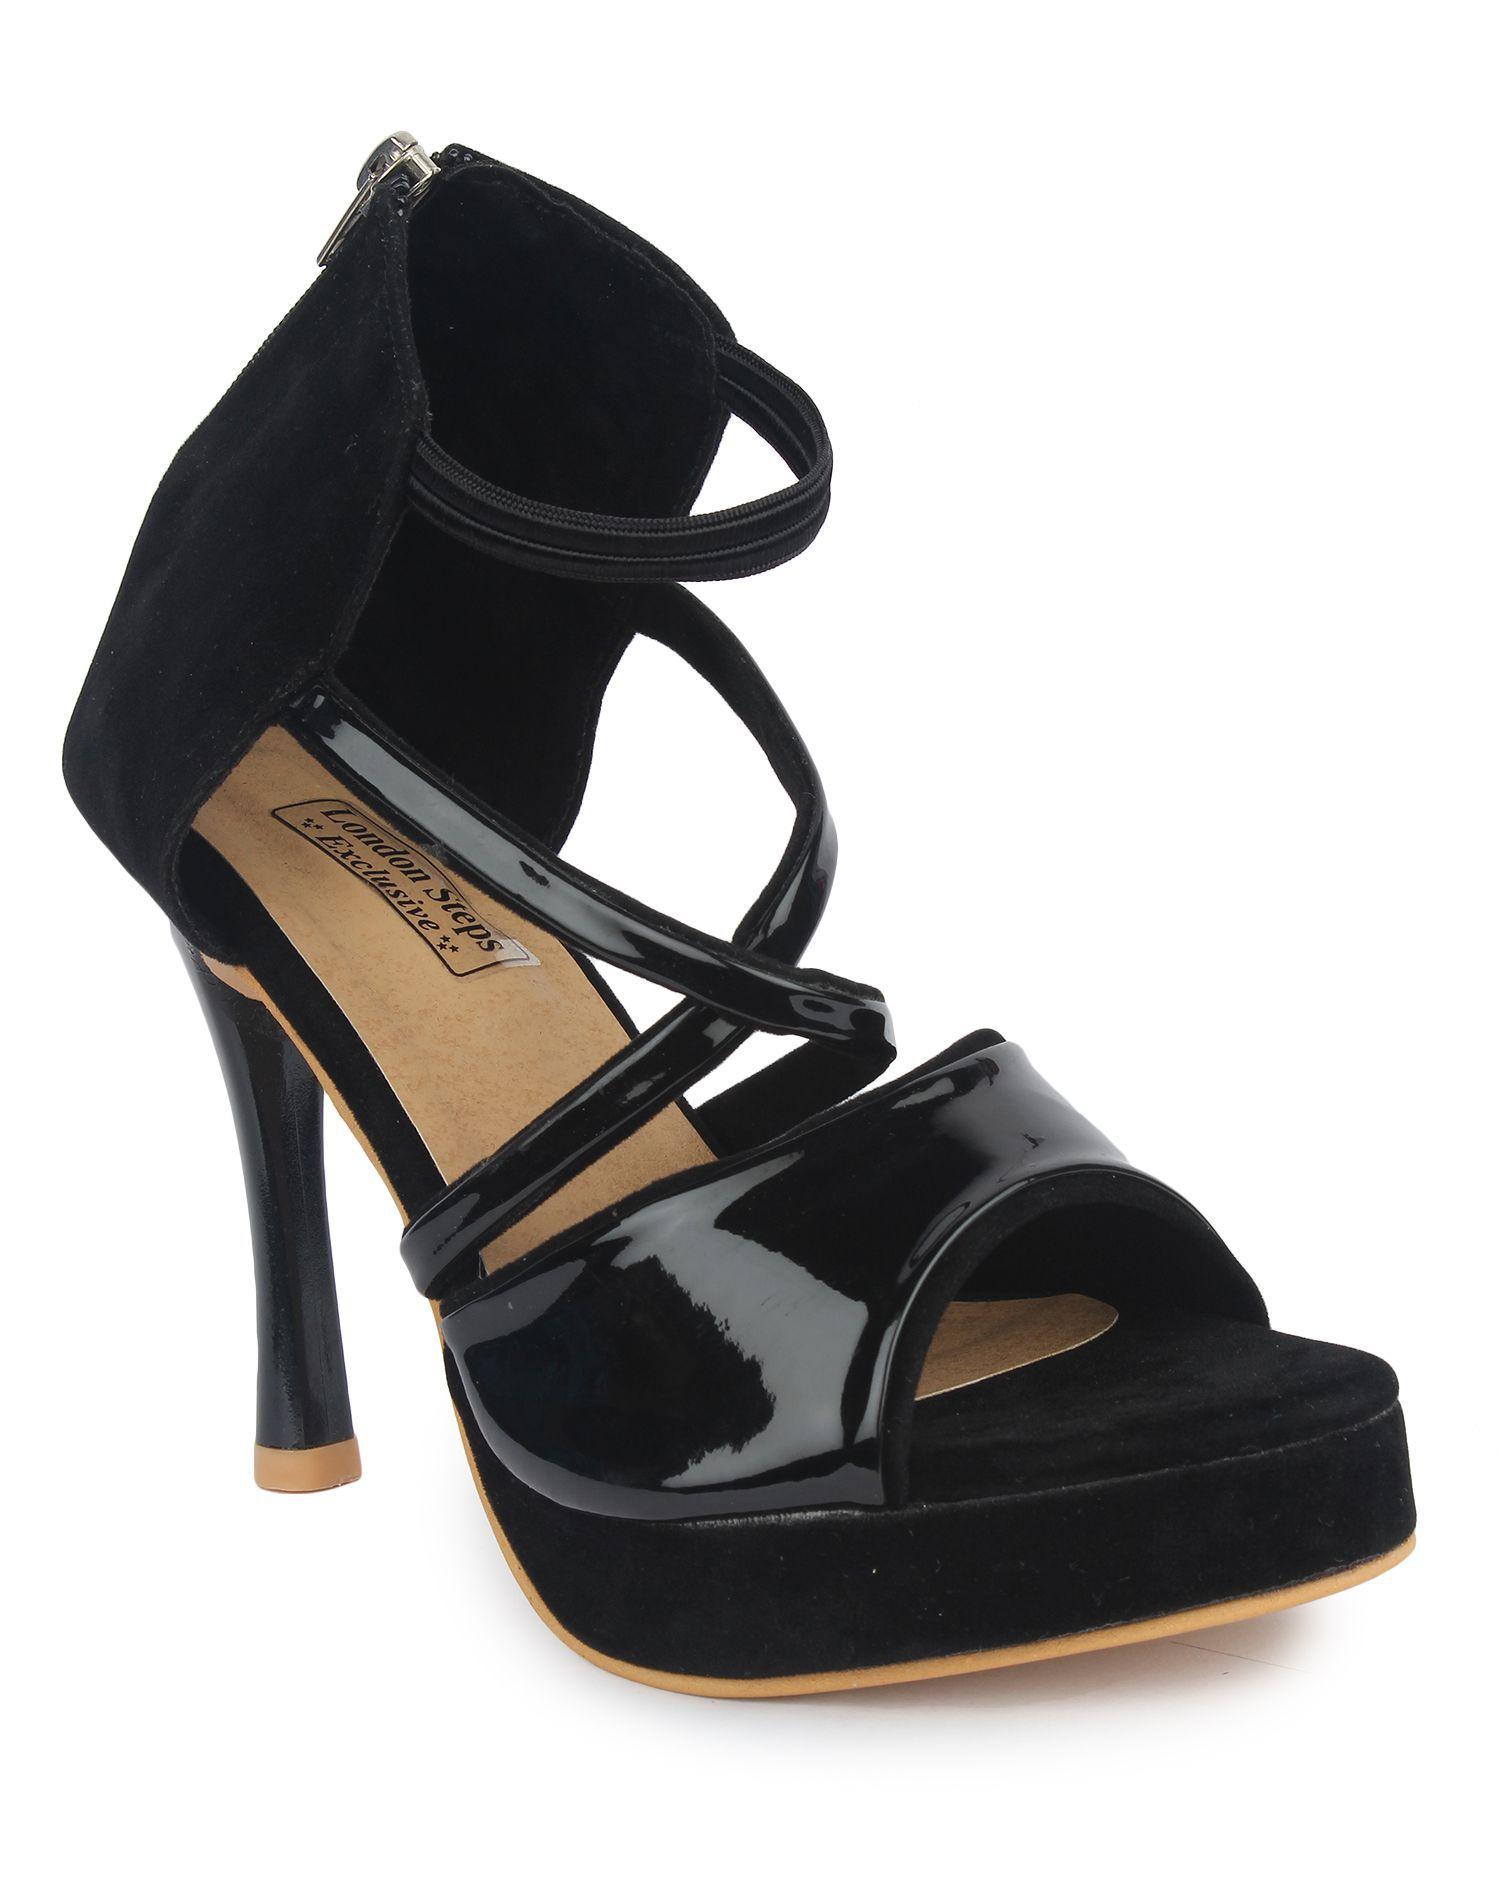 London Steps Black Stiletto Heels